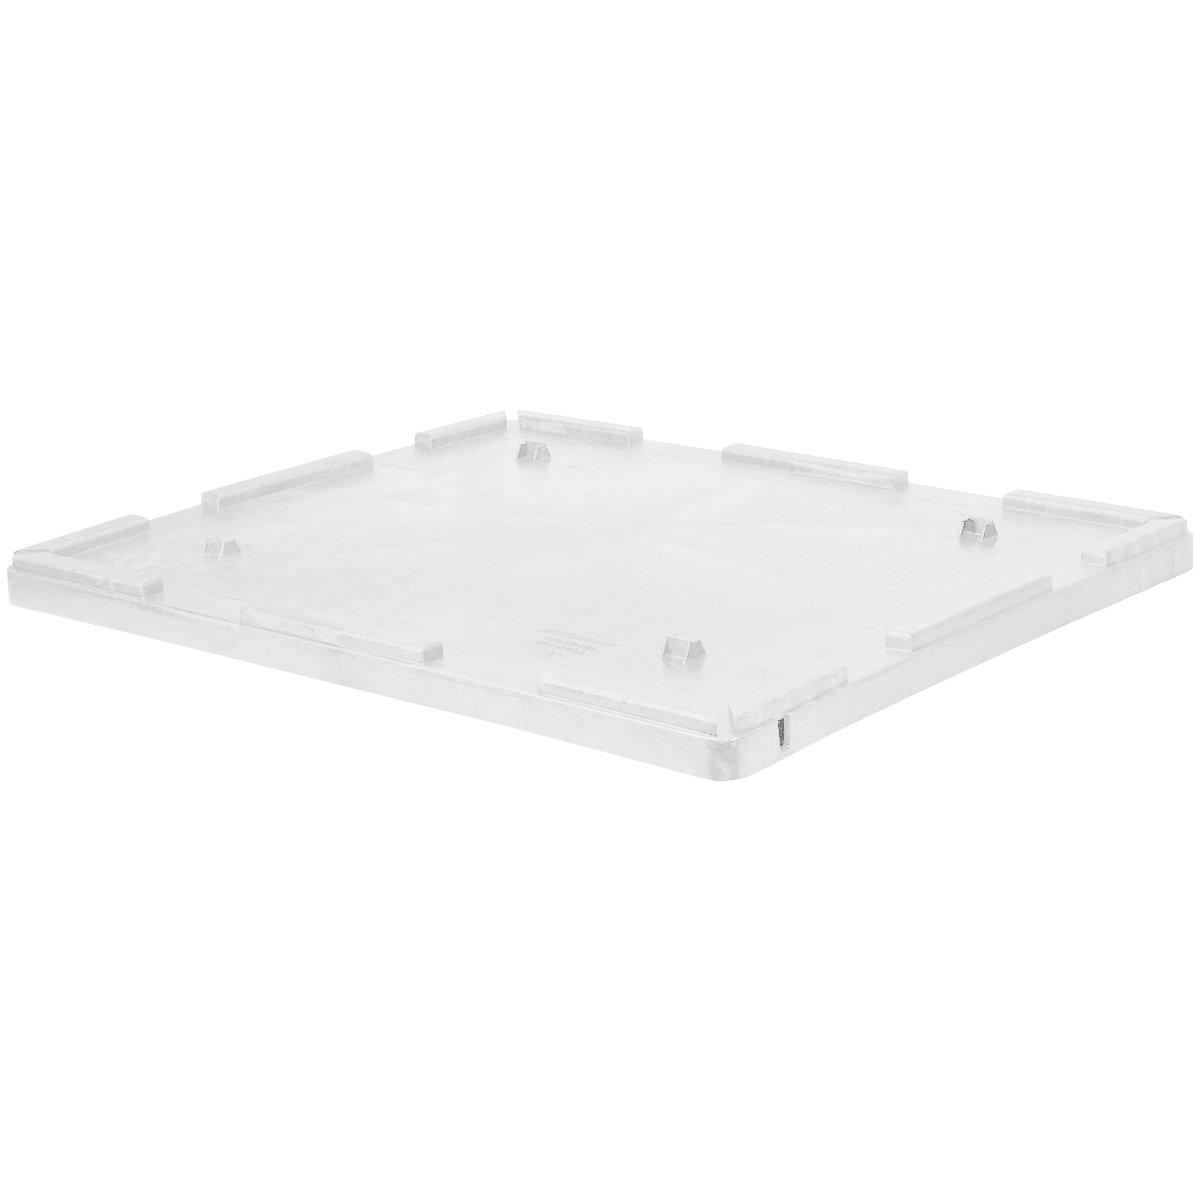 Buckhorn TL48440300SG000 48'' x 44'' Structural Foam Bulk Container Lid, White